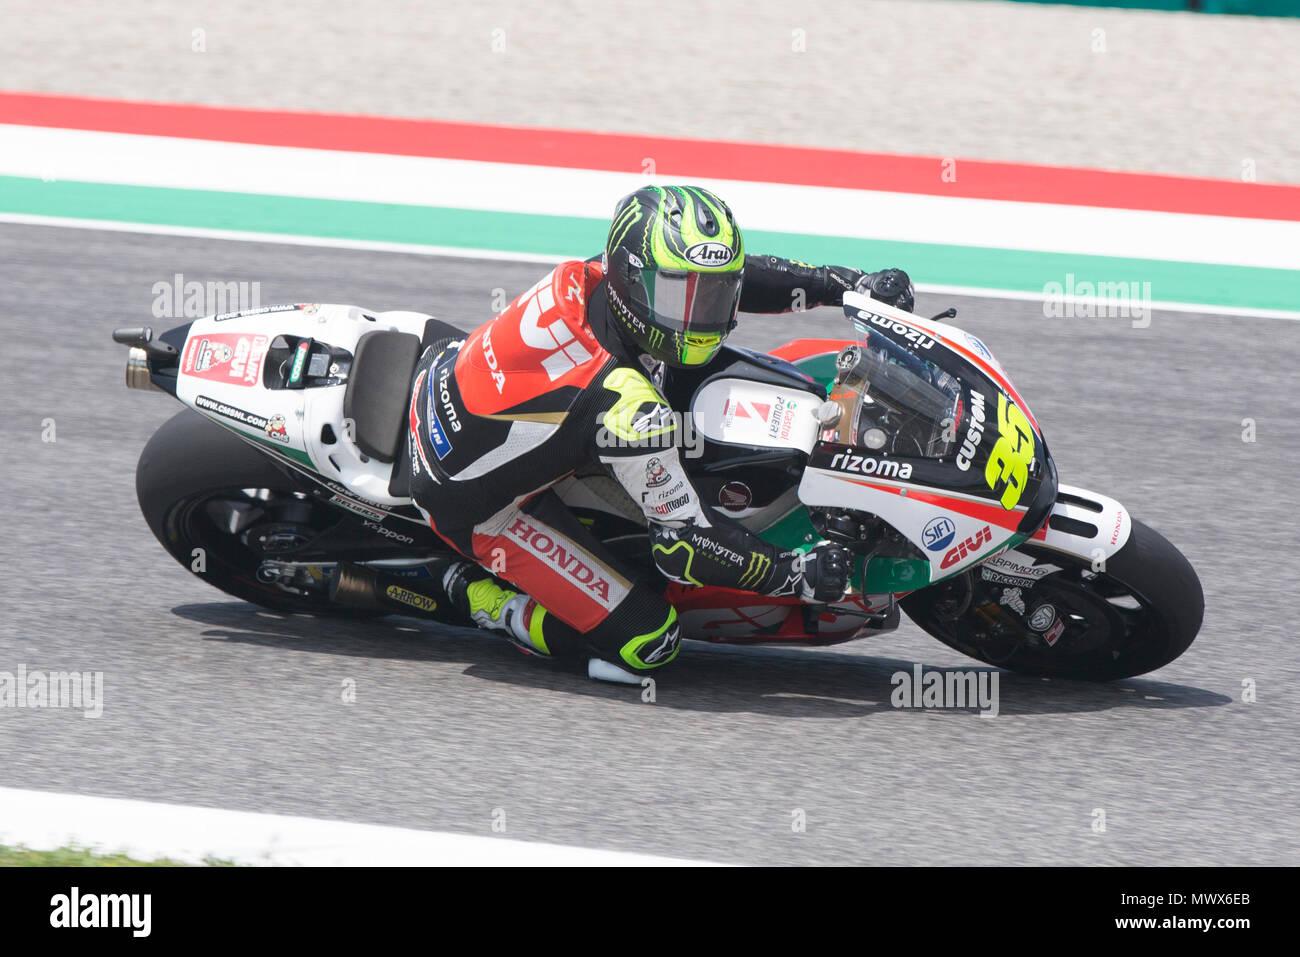 e279d00e6d Qualifications at the Mugello International Cuircuit for the sixth round of  MotoGP World Championship Gran Premio d Italia Oakley on June 2